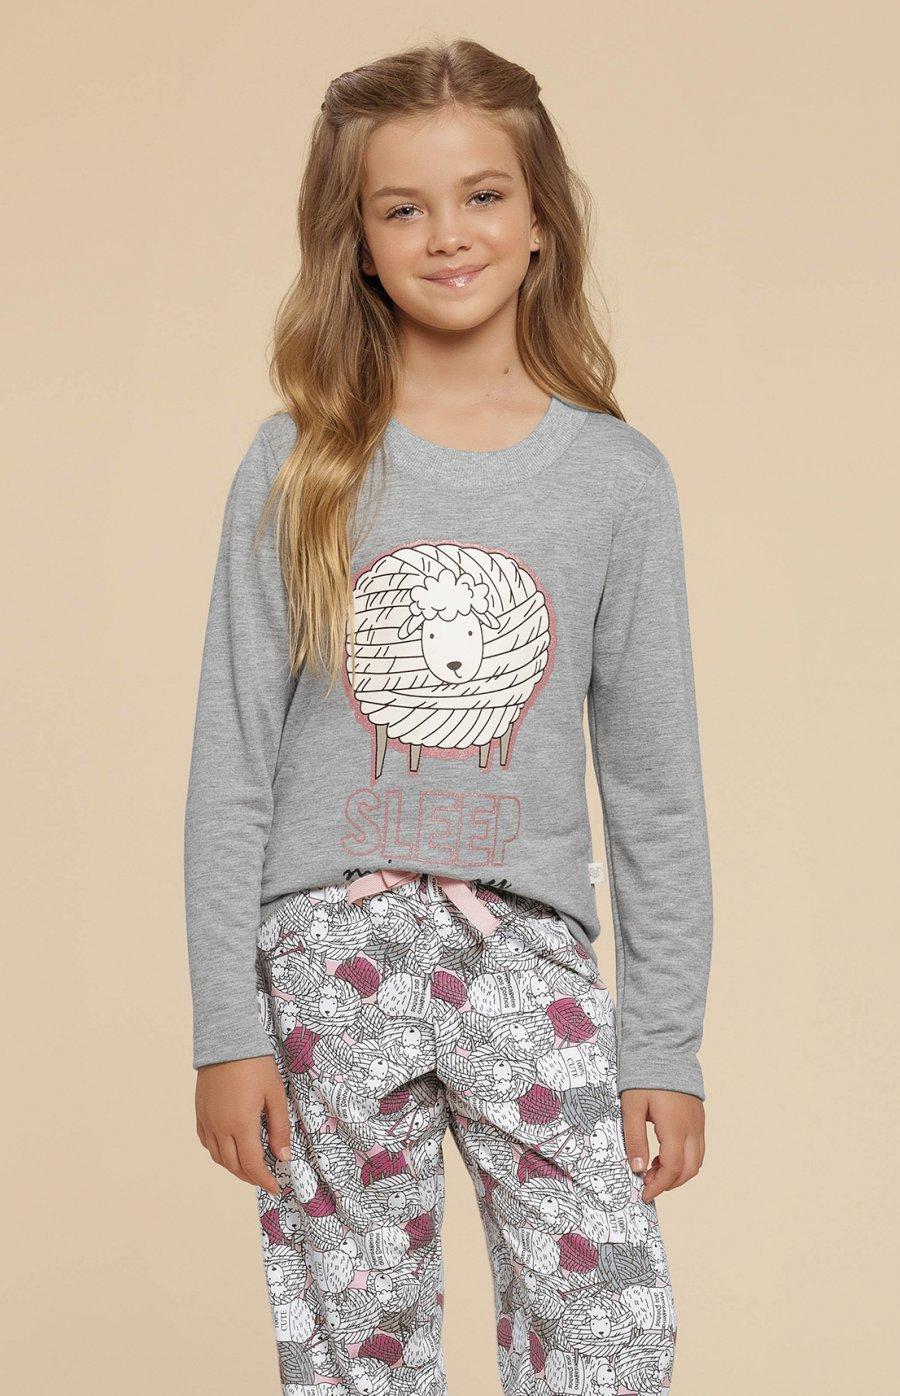 Pijama Infantil Cute Sheep Inverno 2019 - Pré-Venda CLOUD CLUB